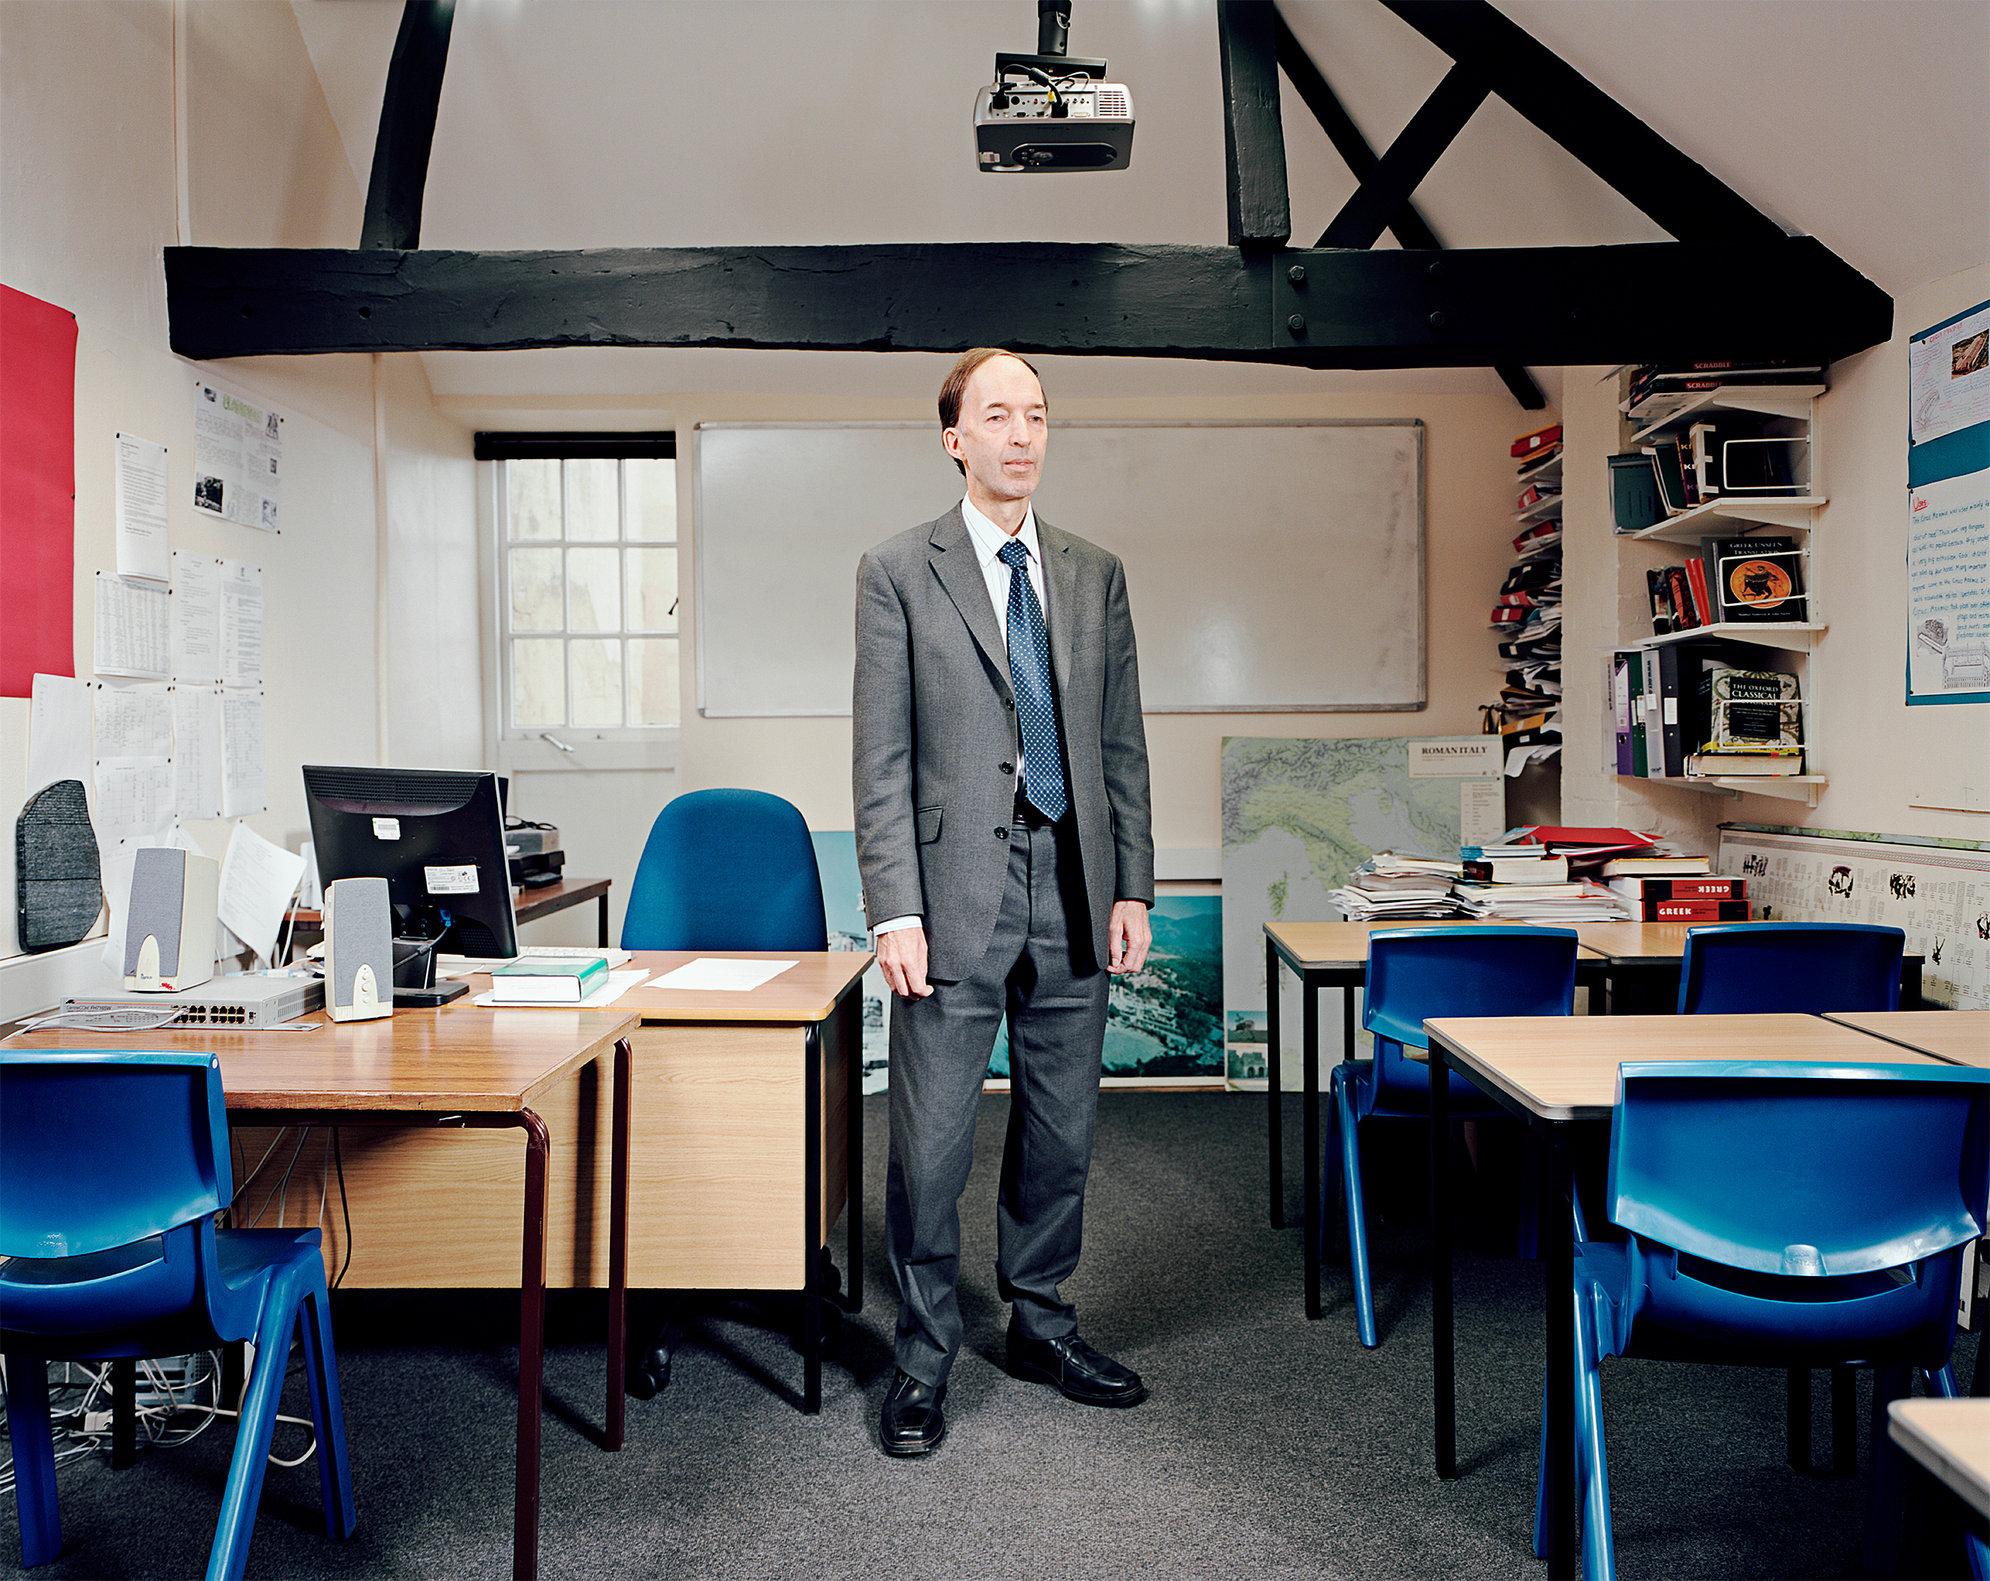 Michael Bevington, Stowe School, Buckinghamshire